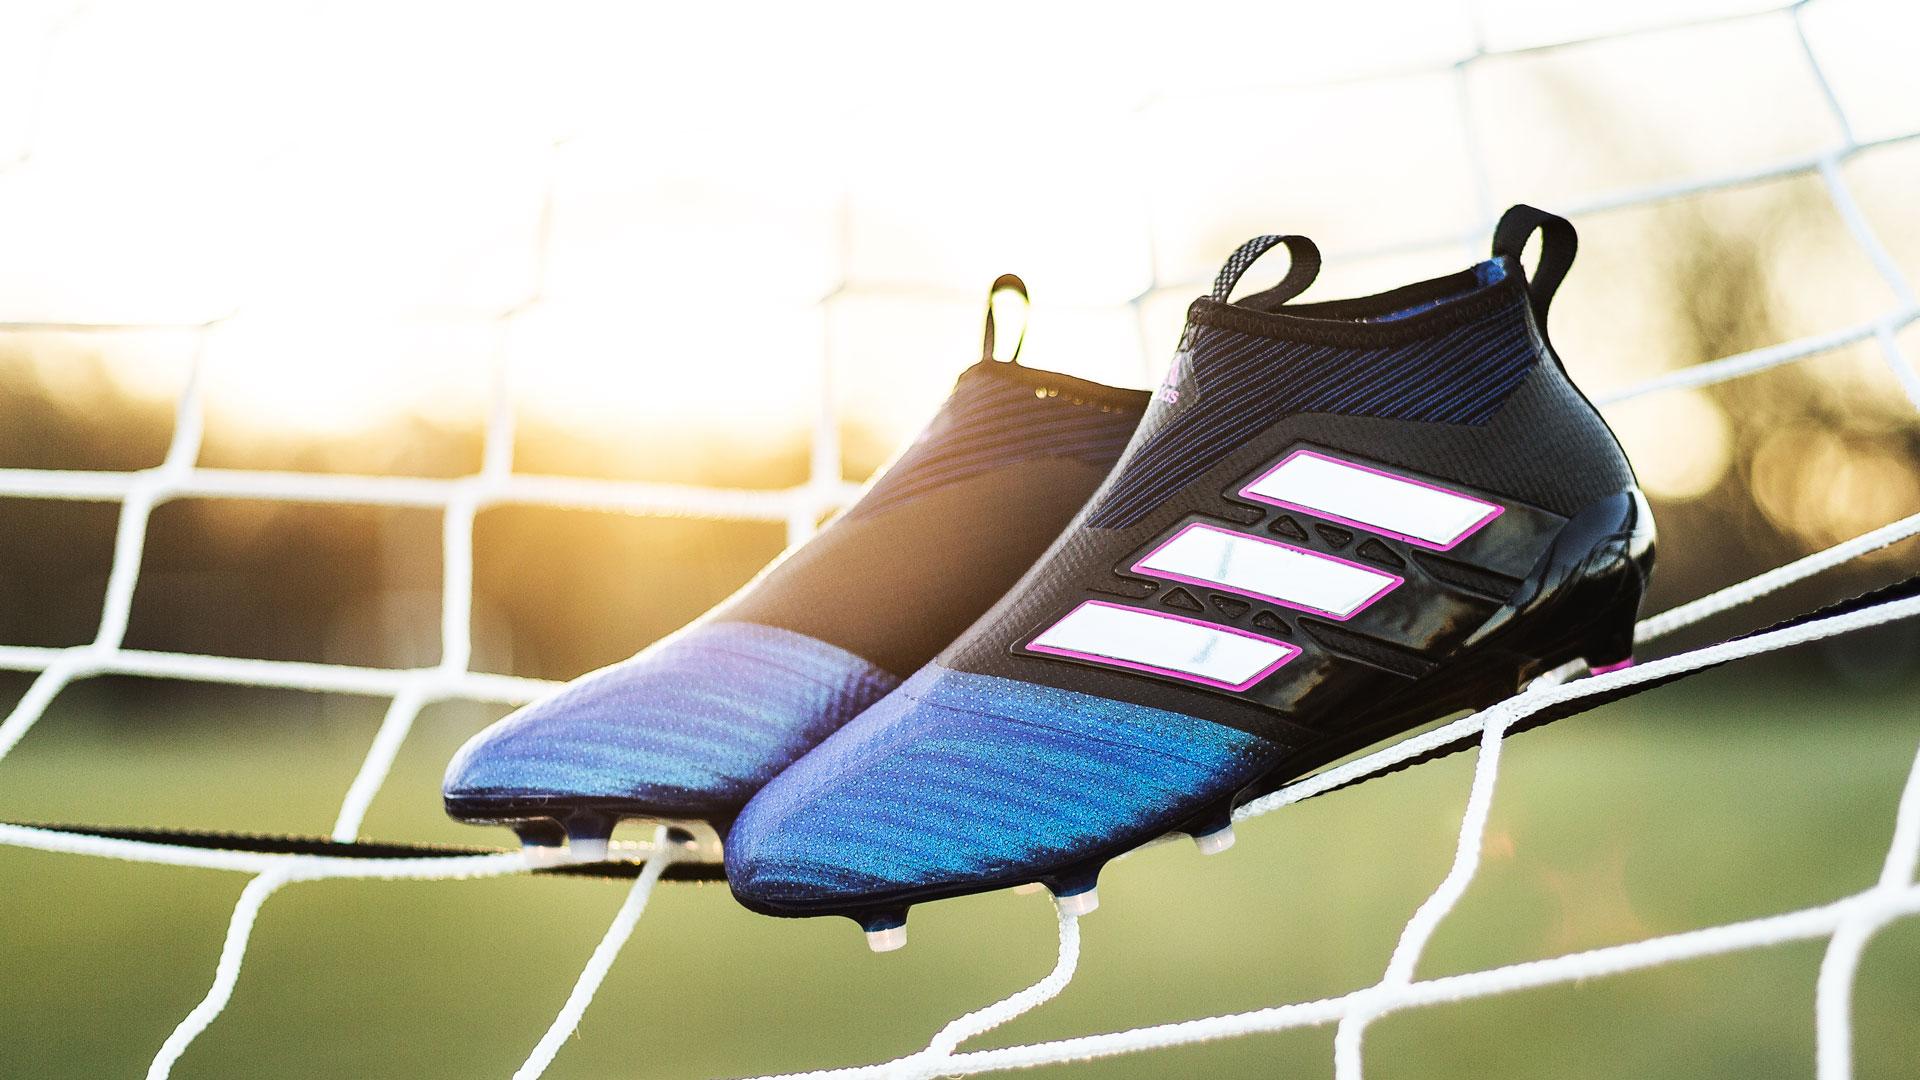 6333e921 bilde av adidas copa tango 17.1 indoor futsal pyro storm pack; adidas ace  17+ purecontrol blue blast ny sko til mesut Özil